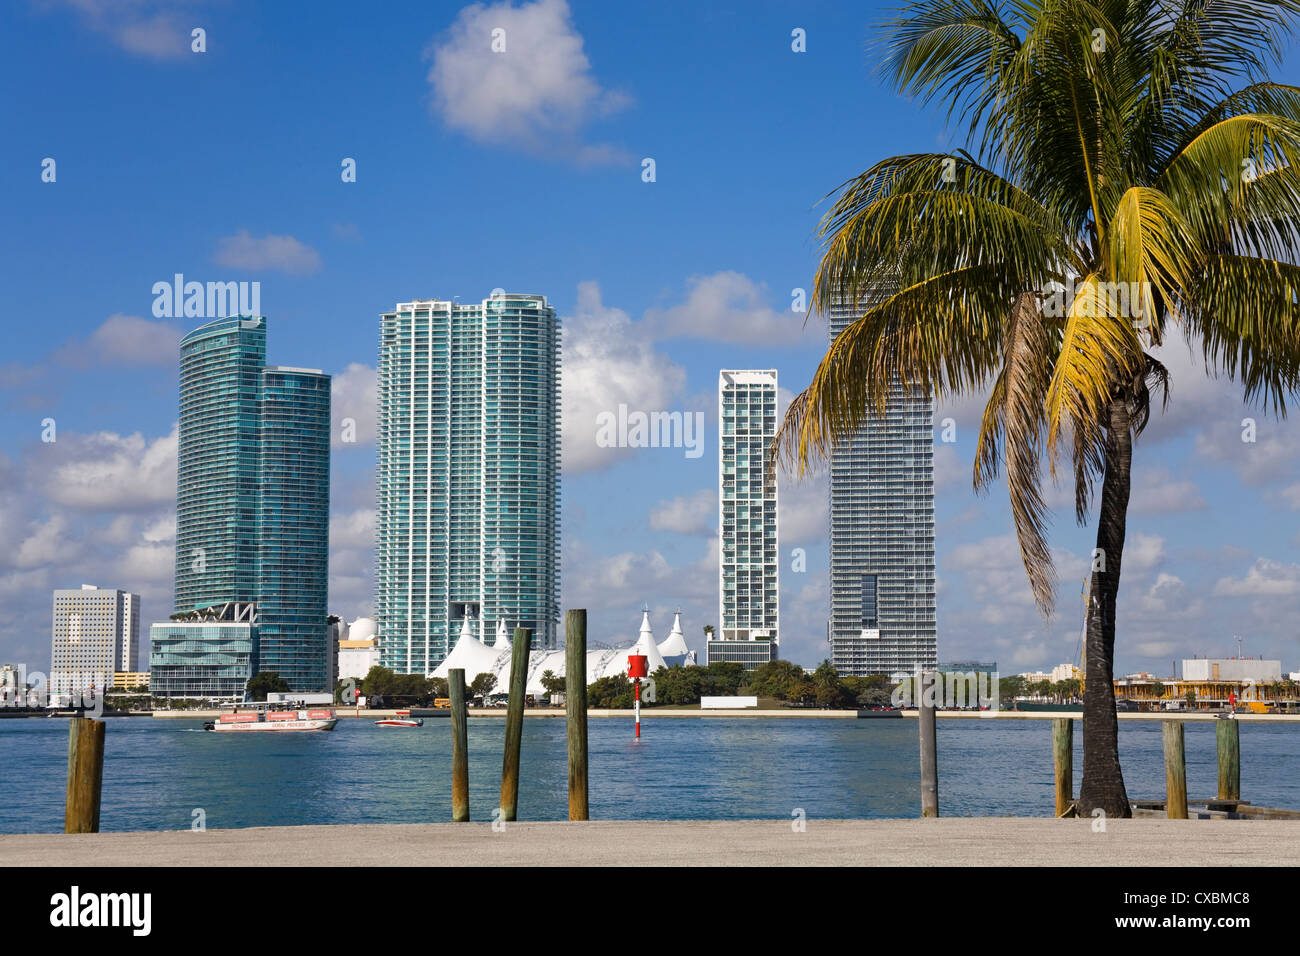 Miami skyline, Florida, United States of America, North America - Stock Image